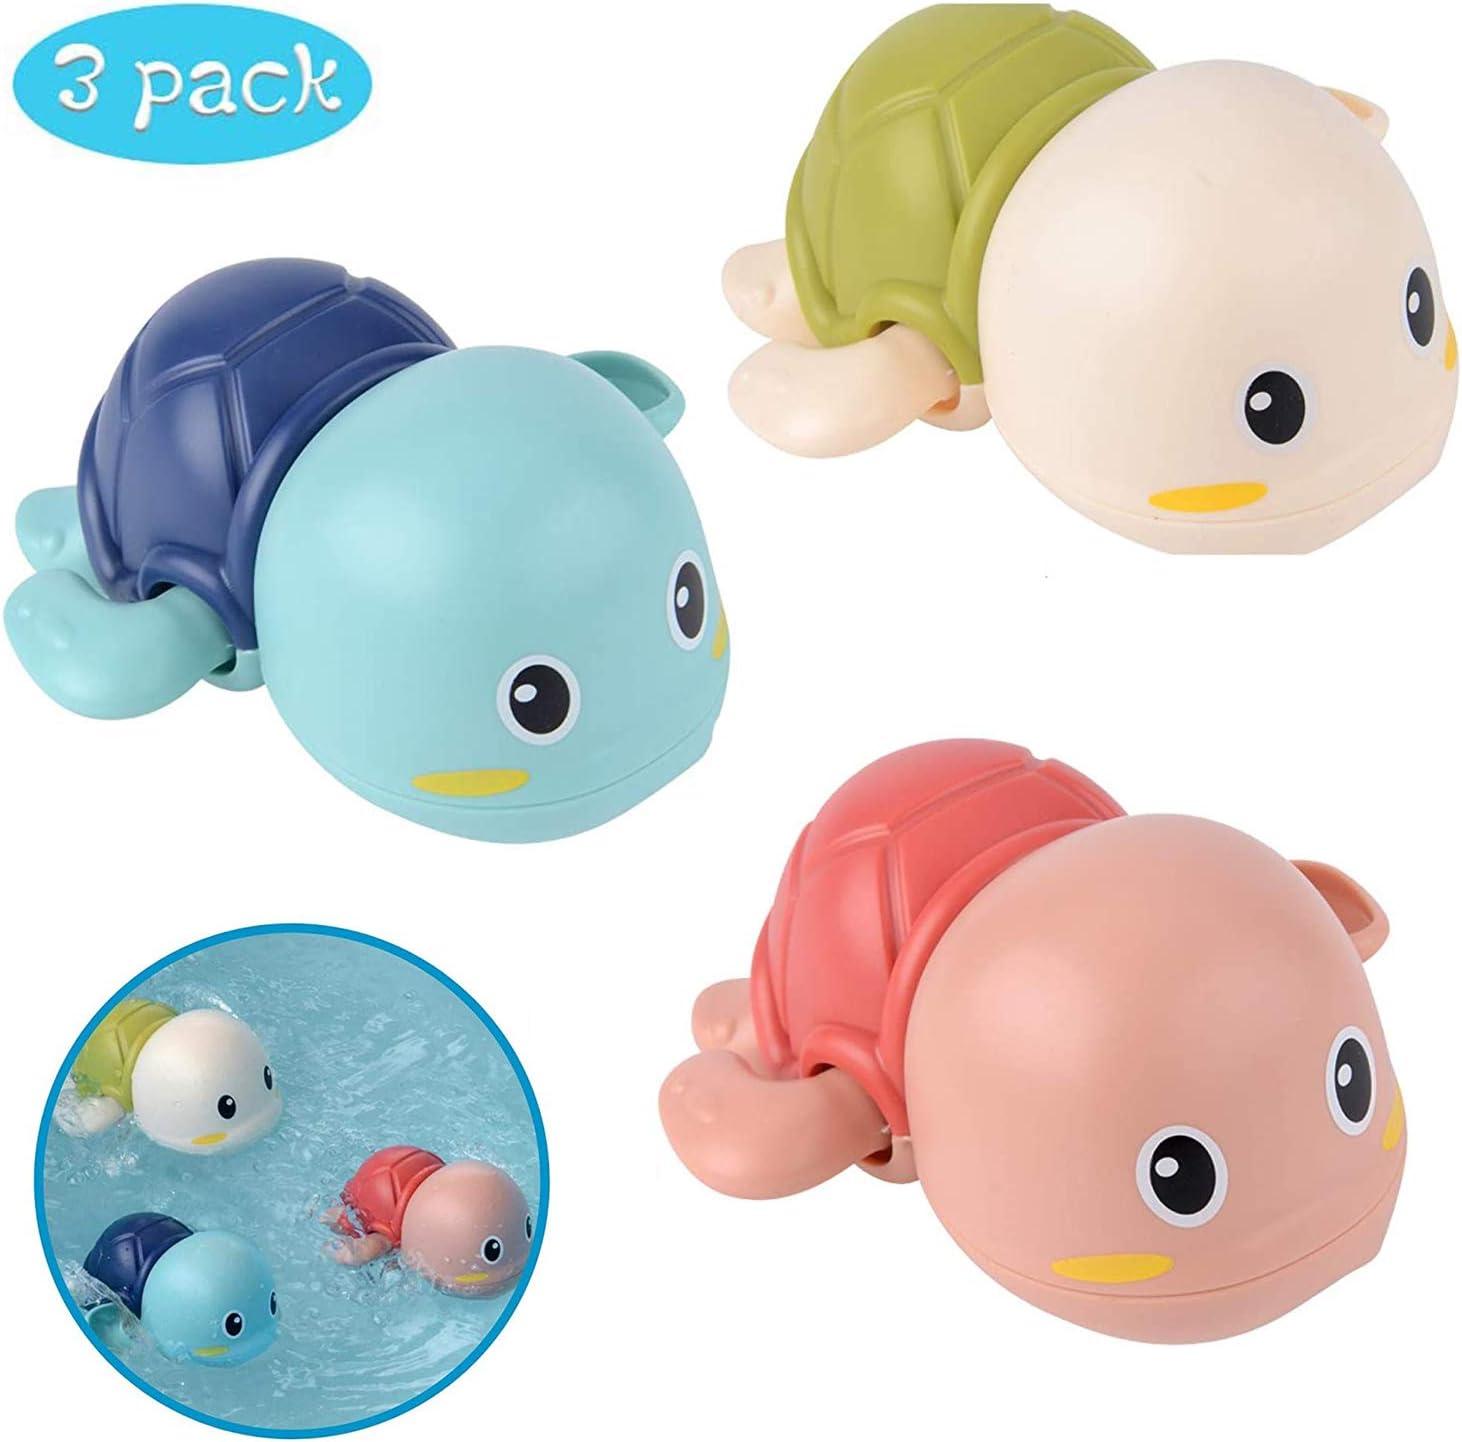 Toddlers Boys Girls 3 Pezzi WENTS Baby Bathing Bath Vasca da Bagno Pool Toy Baby Bathing Clockwork Turtle Anatra Bath Toys for Bambini